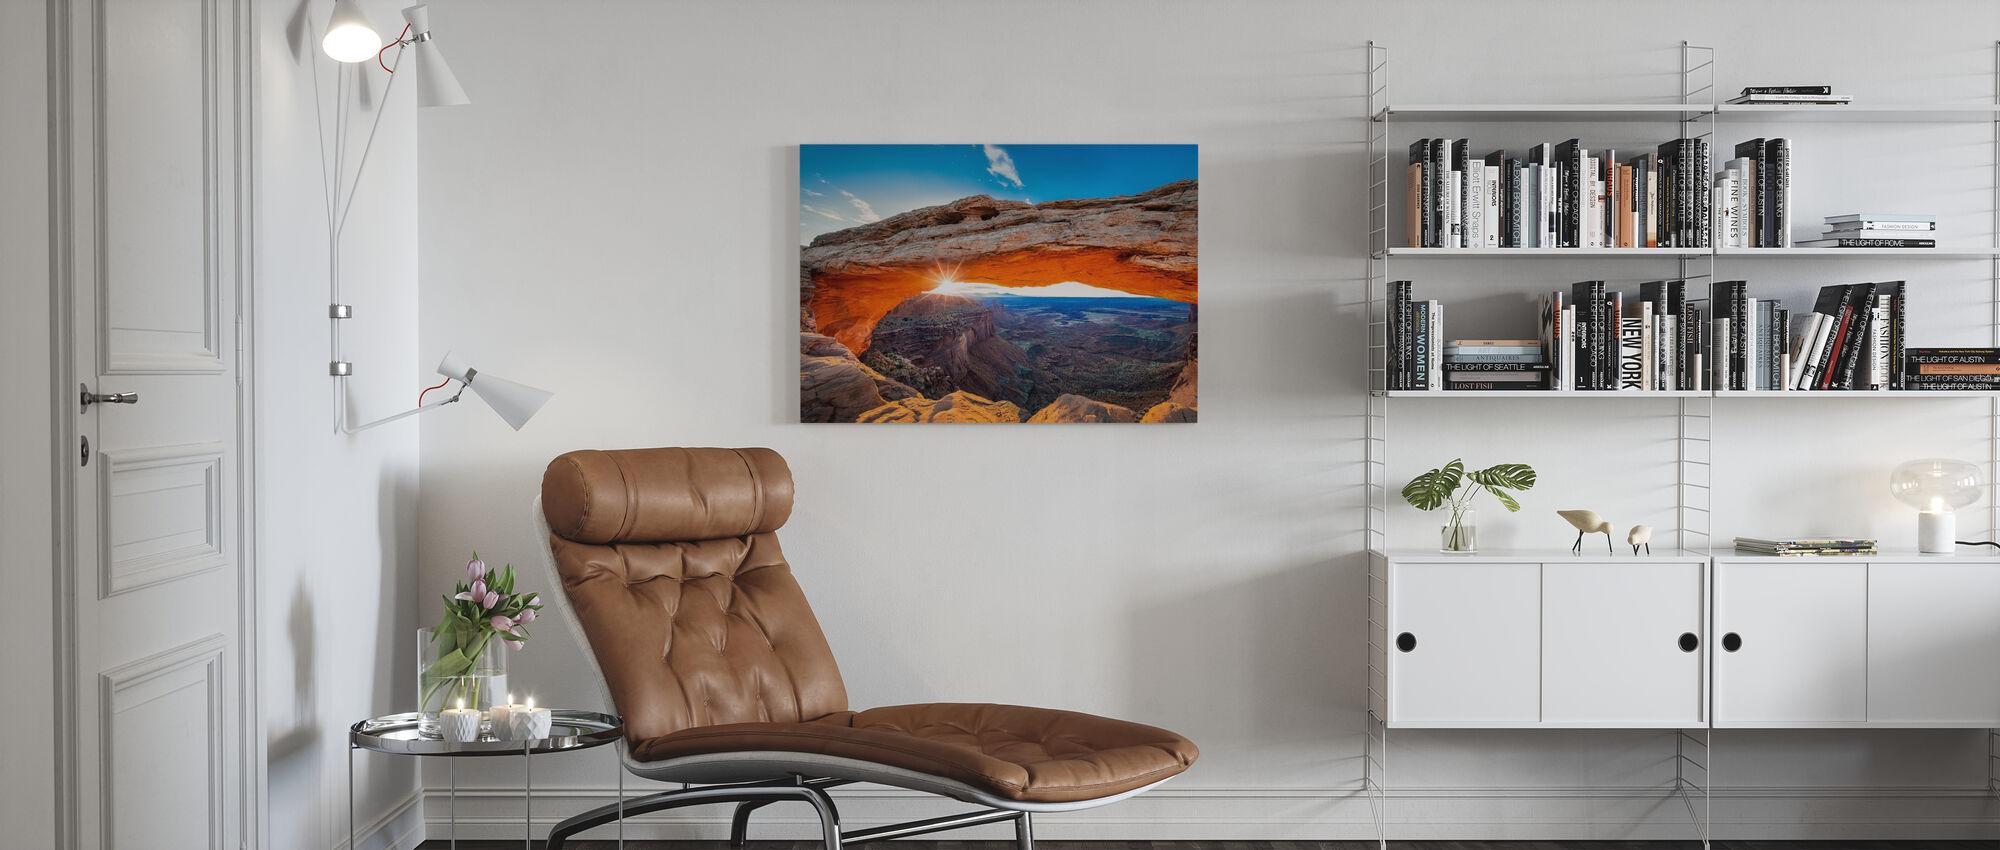 Sunrise at Mesa Arch - Canvas print - Living Room